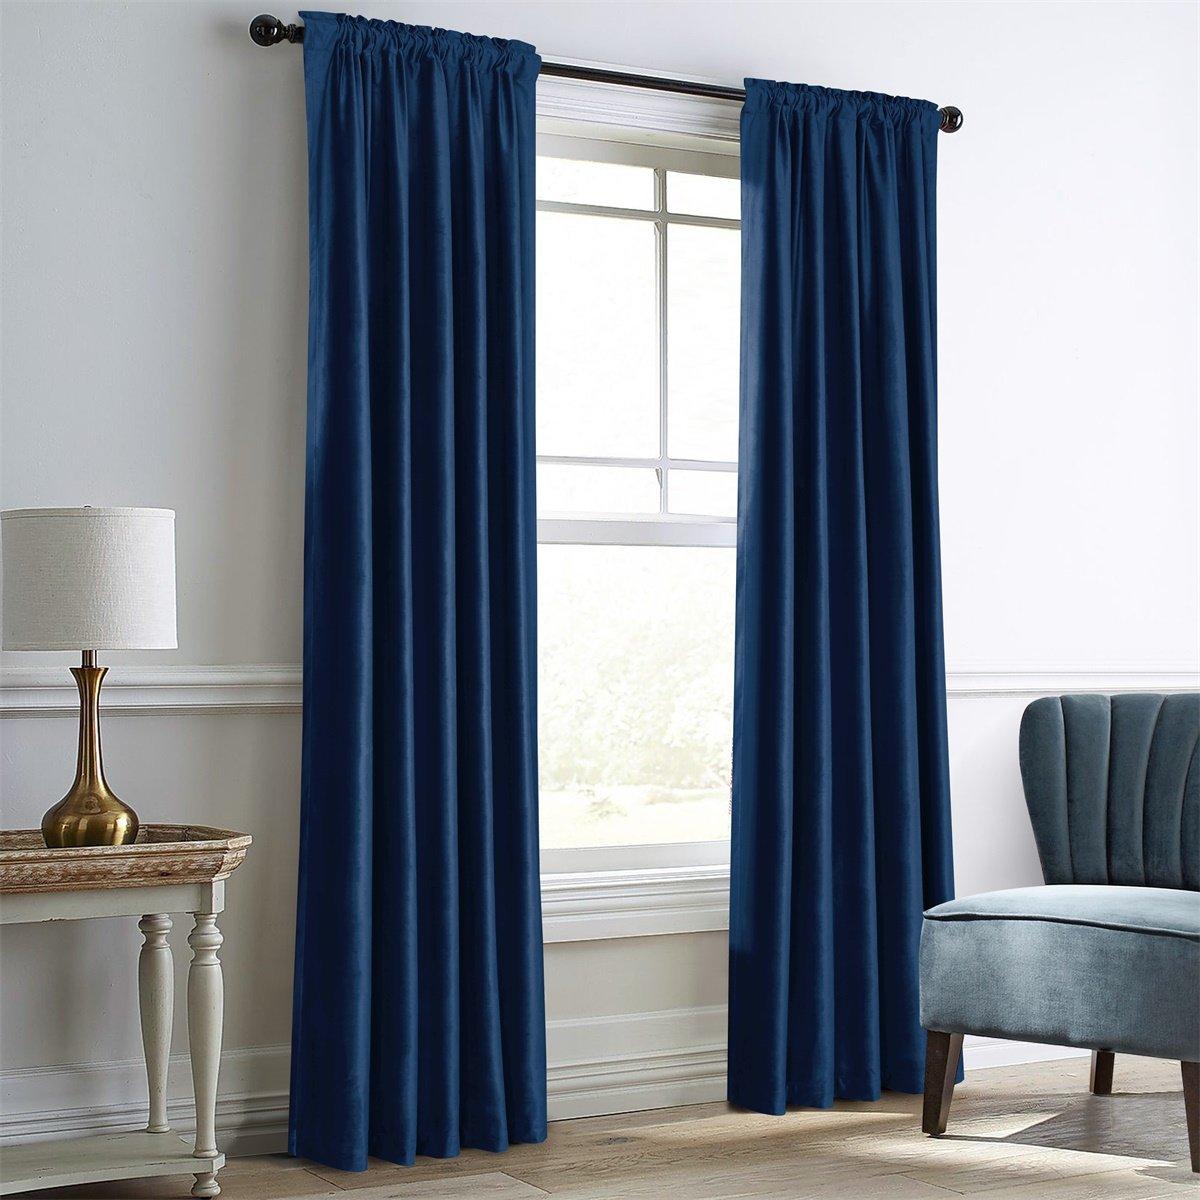 Dreaming Casa Royal Blue Velvet Room Darkening Curtains for Living  Room,Thermal Insulated Rod Pocket/Back Tab Window Curtain for Bedroom(2  Panels,52\